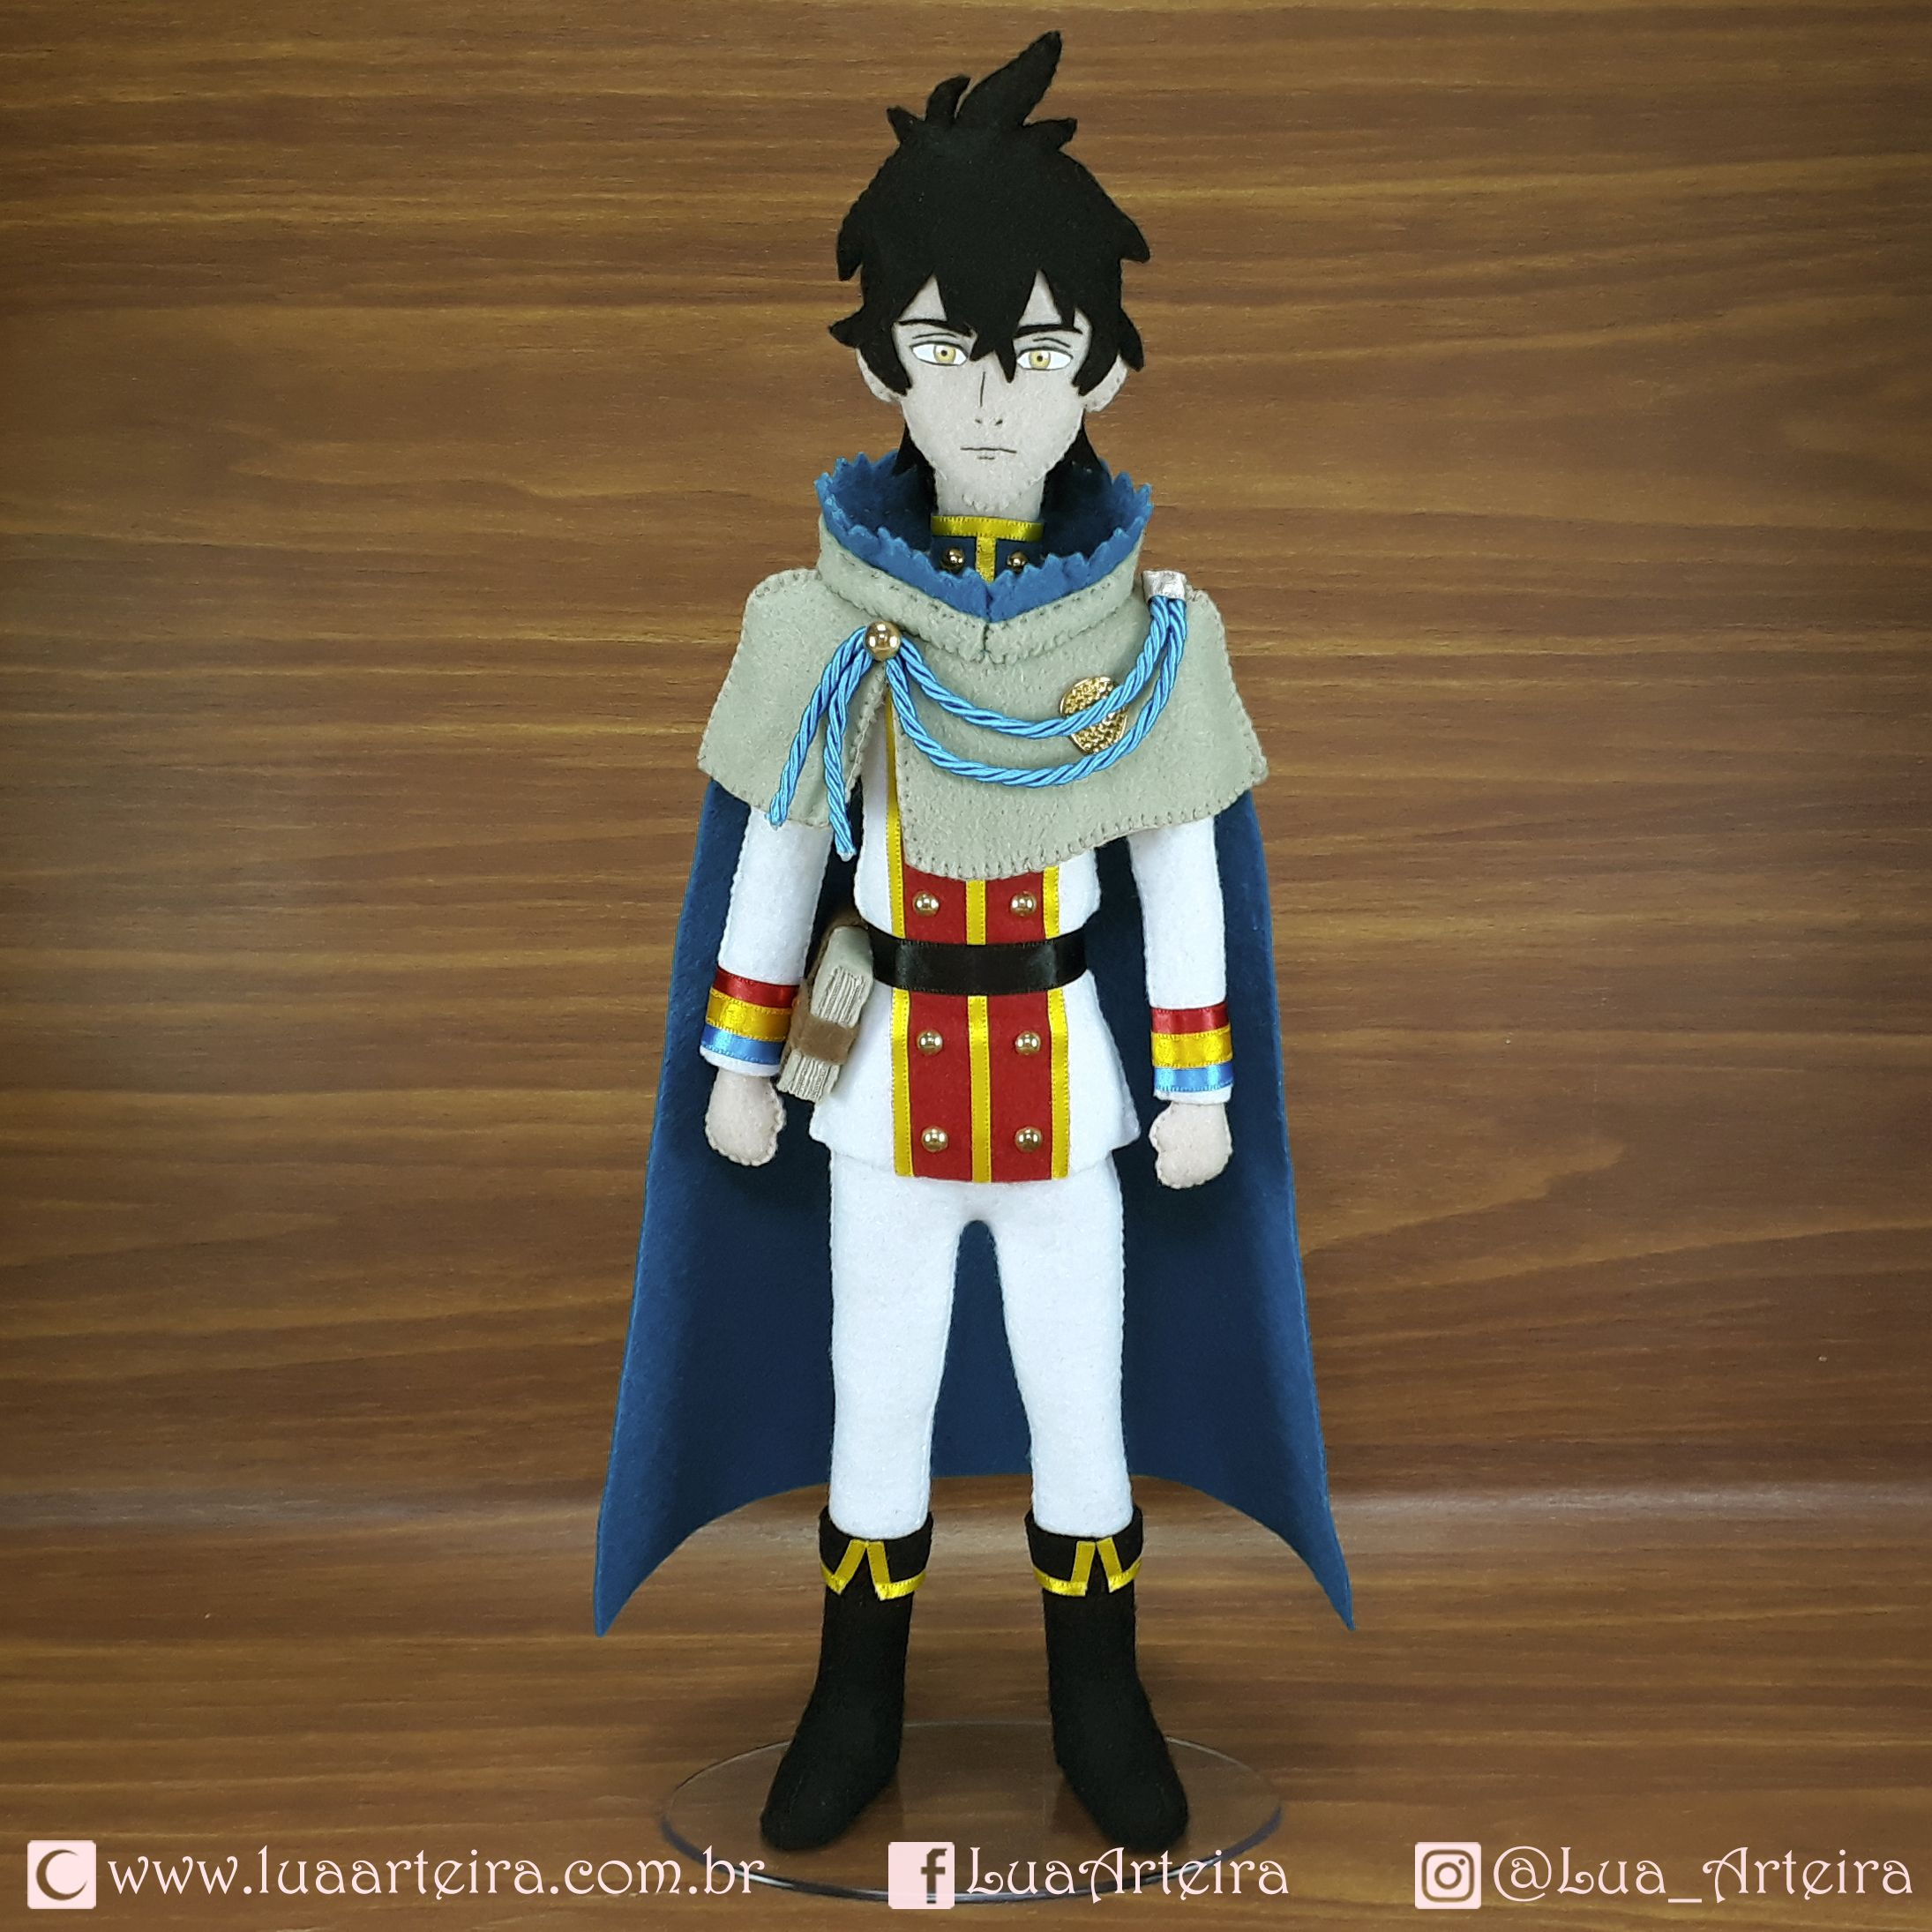 Ghim Tren Personagens Julius novachrono 「ユリウス・ノヴァクロノ yuriusu novakurono」 is the 28th magic emperor of the clover kingdom's magic knights. ghim tren personagens